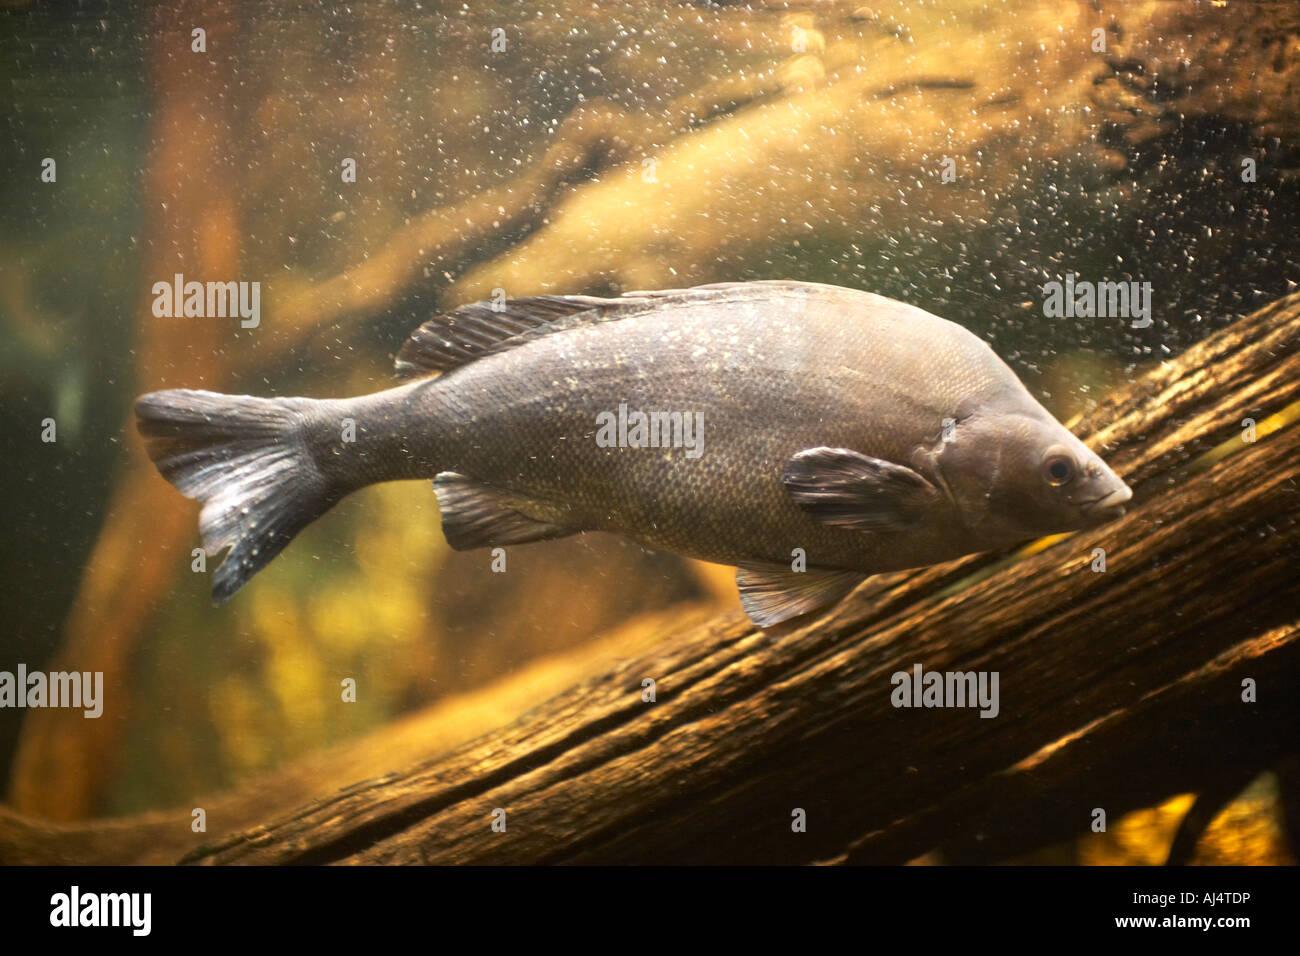 Freshwater fish in australia - Freshwater Fish In Sydney Aquarium Darling Harbour New South Wales Nsw Australia